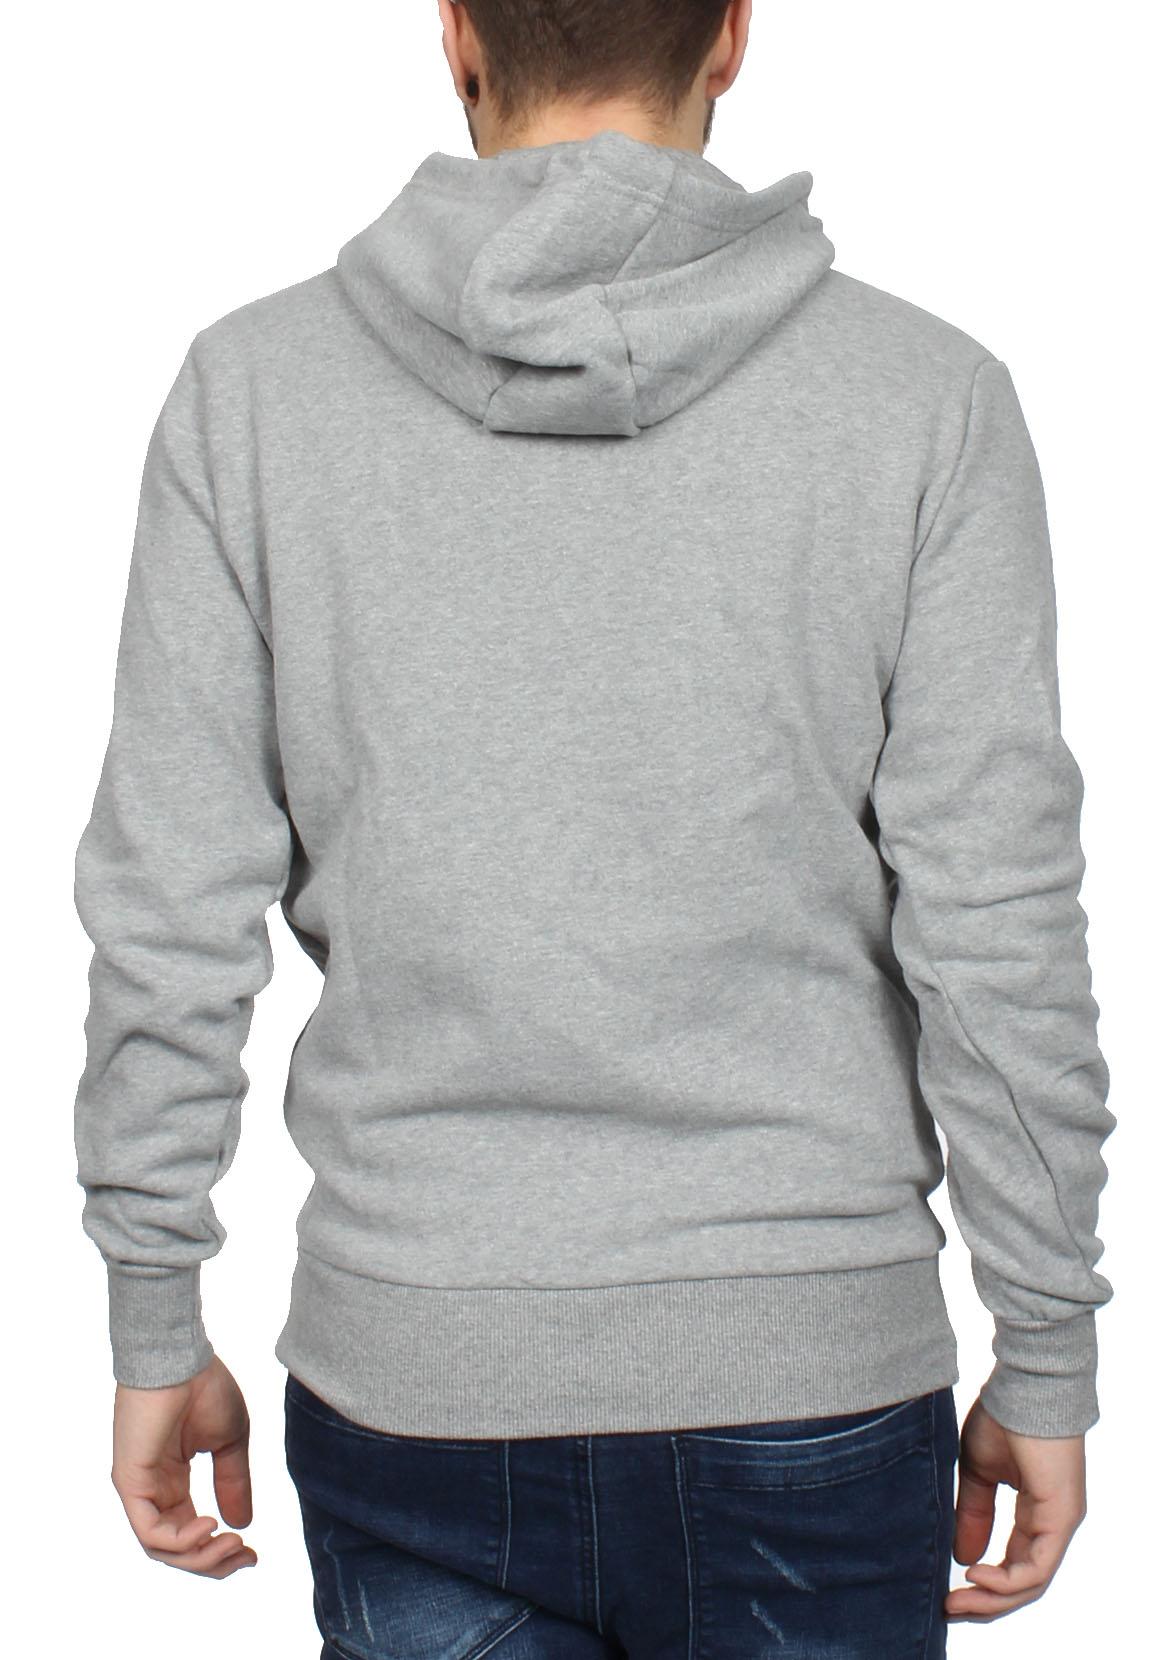 Ellesse-TOCE Oh Hoodie Dress Blues Capuche Hooded Sweater